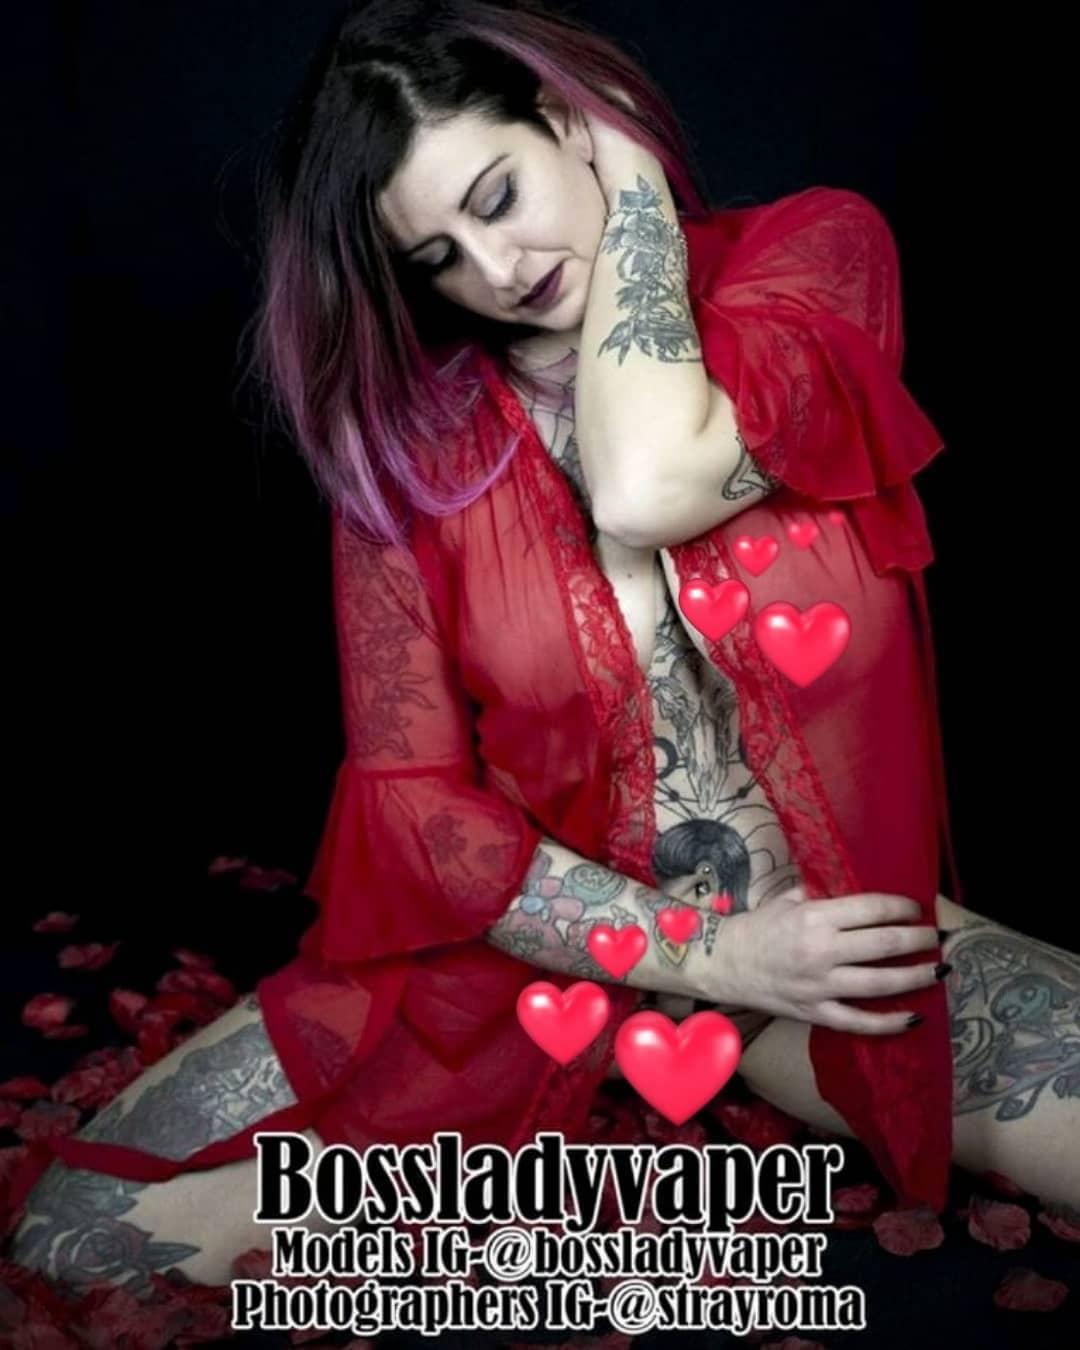 Boss Lady Vaper Instagram – 2020-02-14 09:38:51 84481907 1549516571873228 6061947324747683779 n